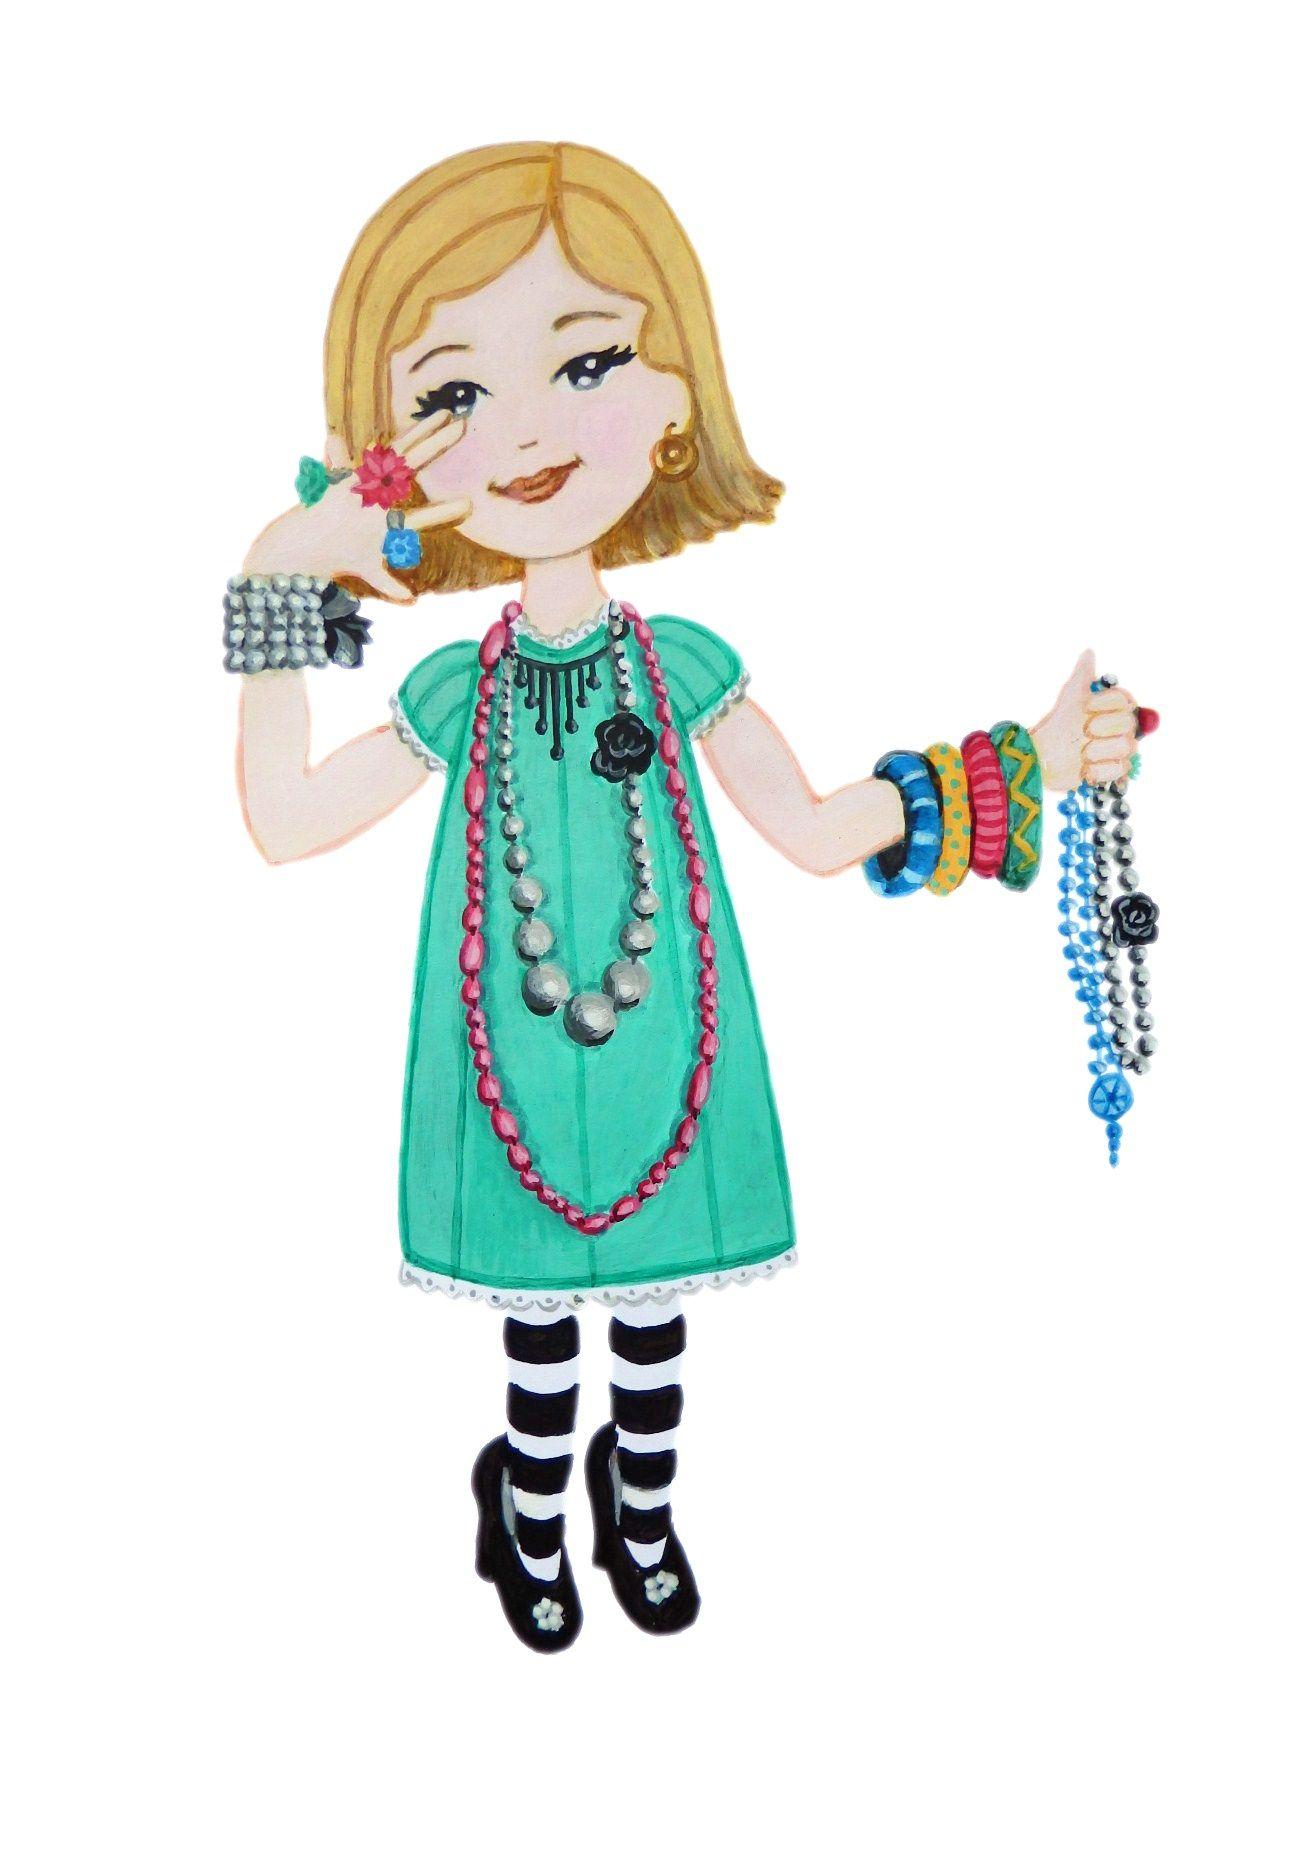 Dibujo de nia con collares  Nat  Pinterest  Dibujo